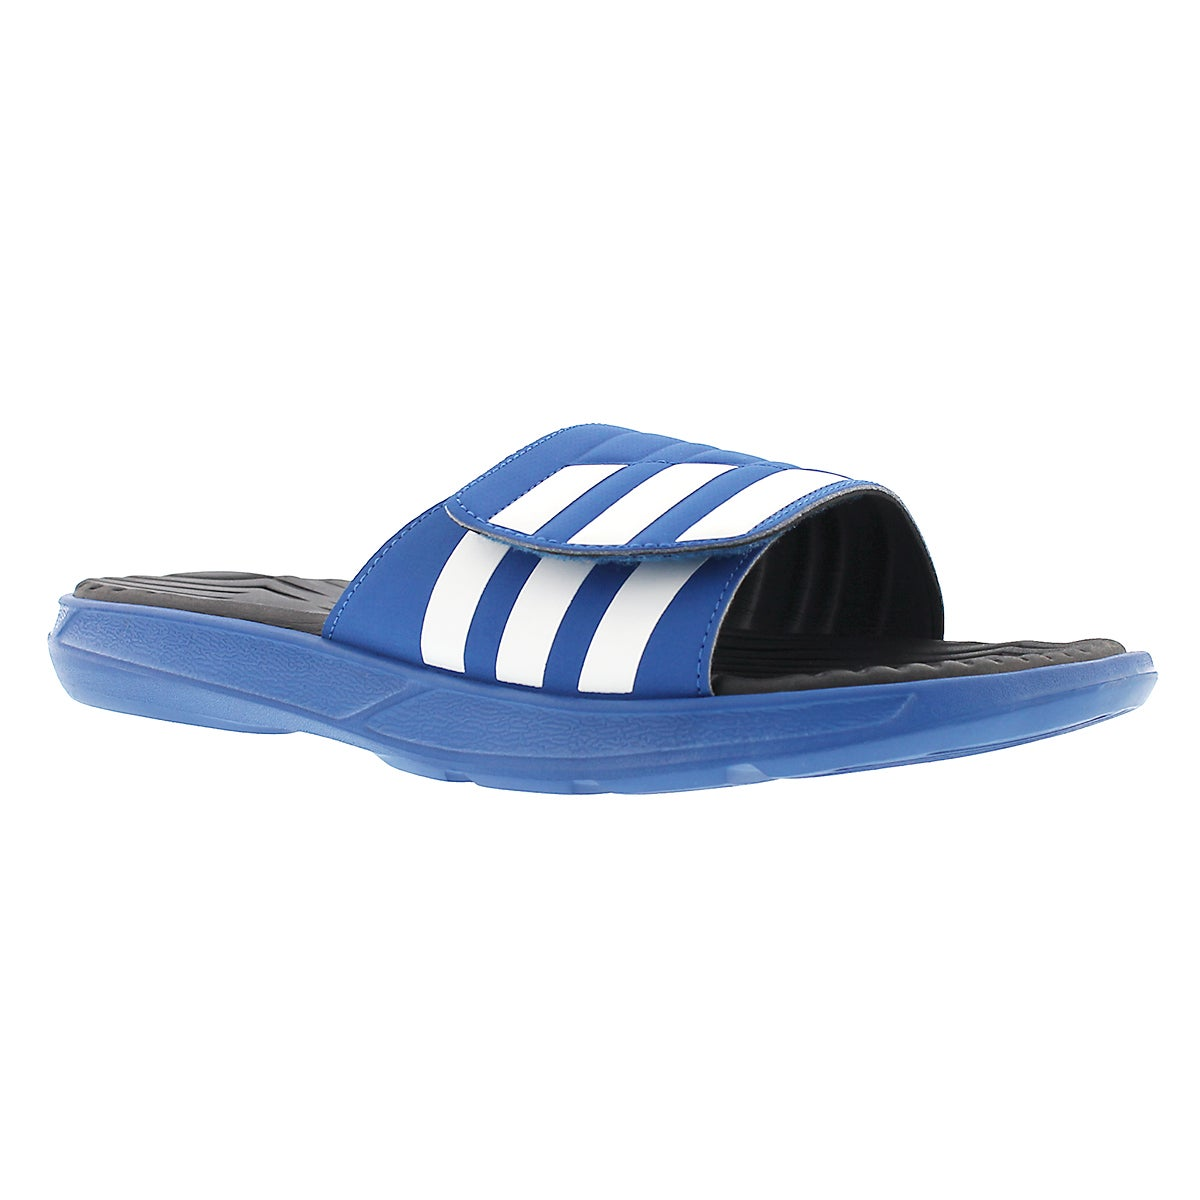 Mns Izamo blue/white slide sandal